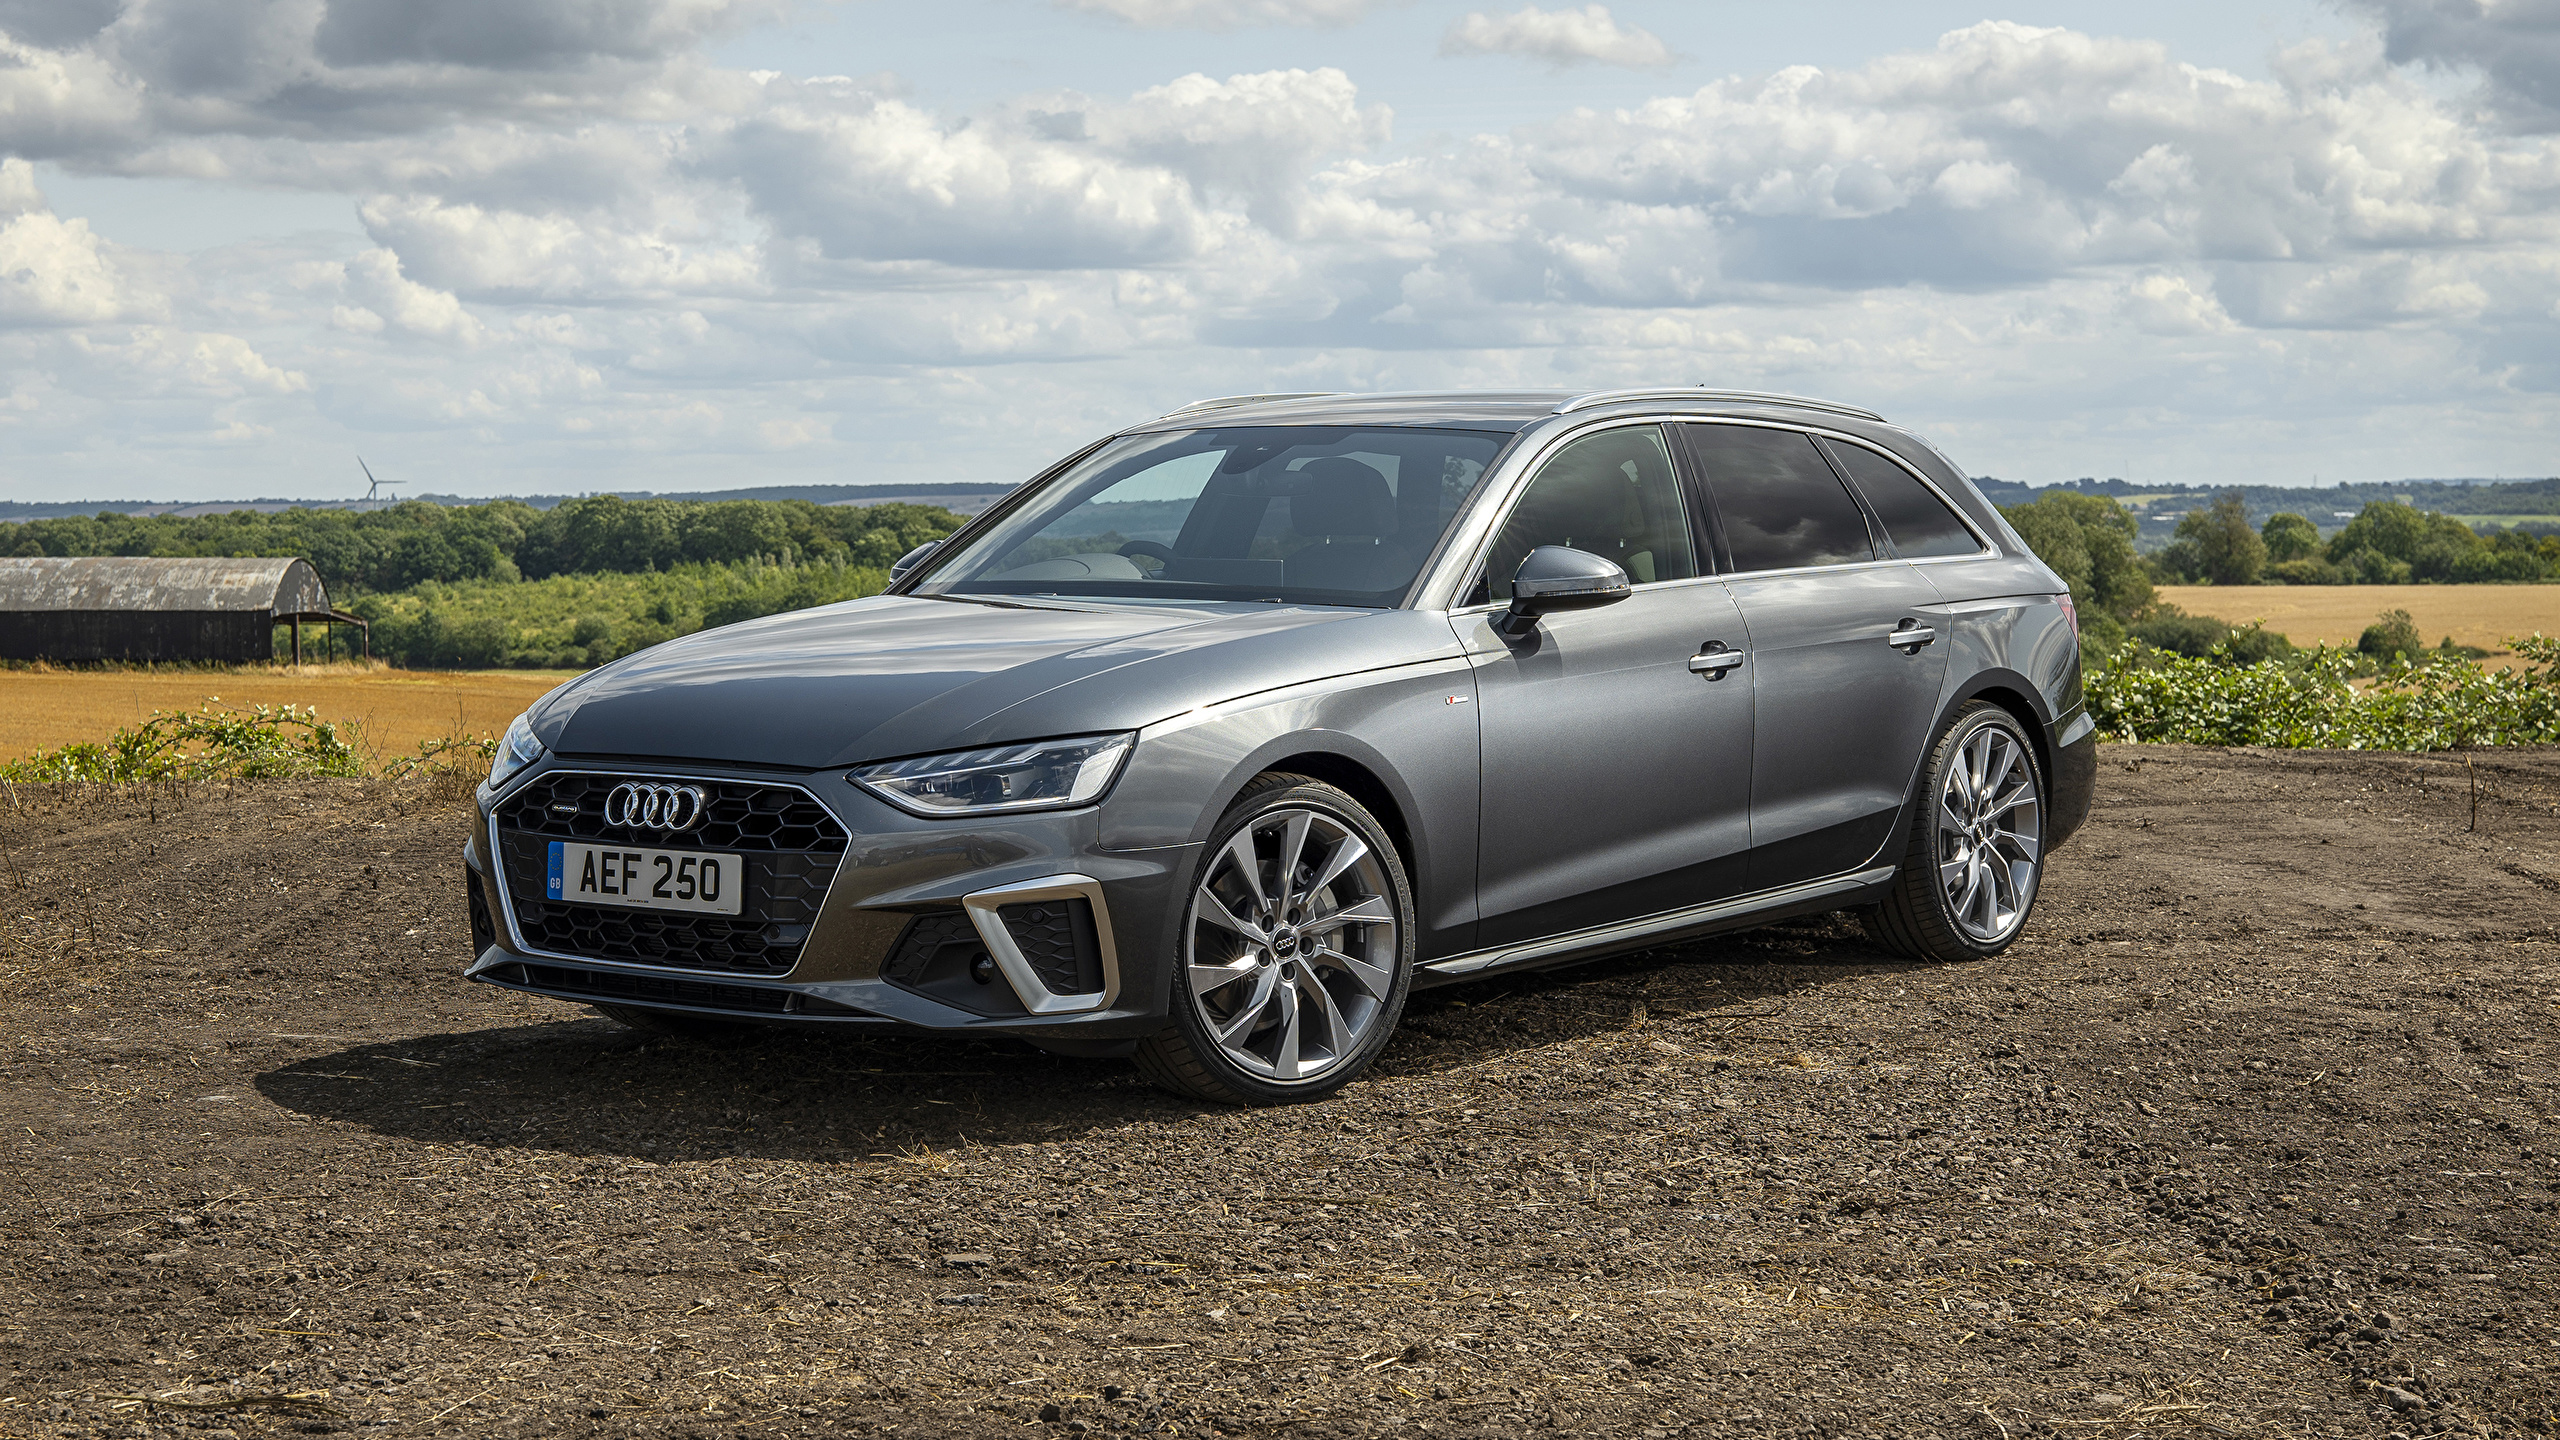 Photo Audi Estate Car 2019 A4 Avant 40 Tdi S Line Quattro 2560x1440